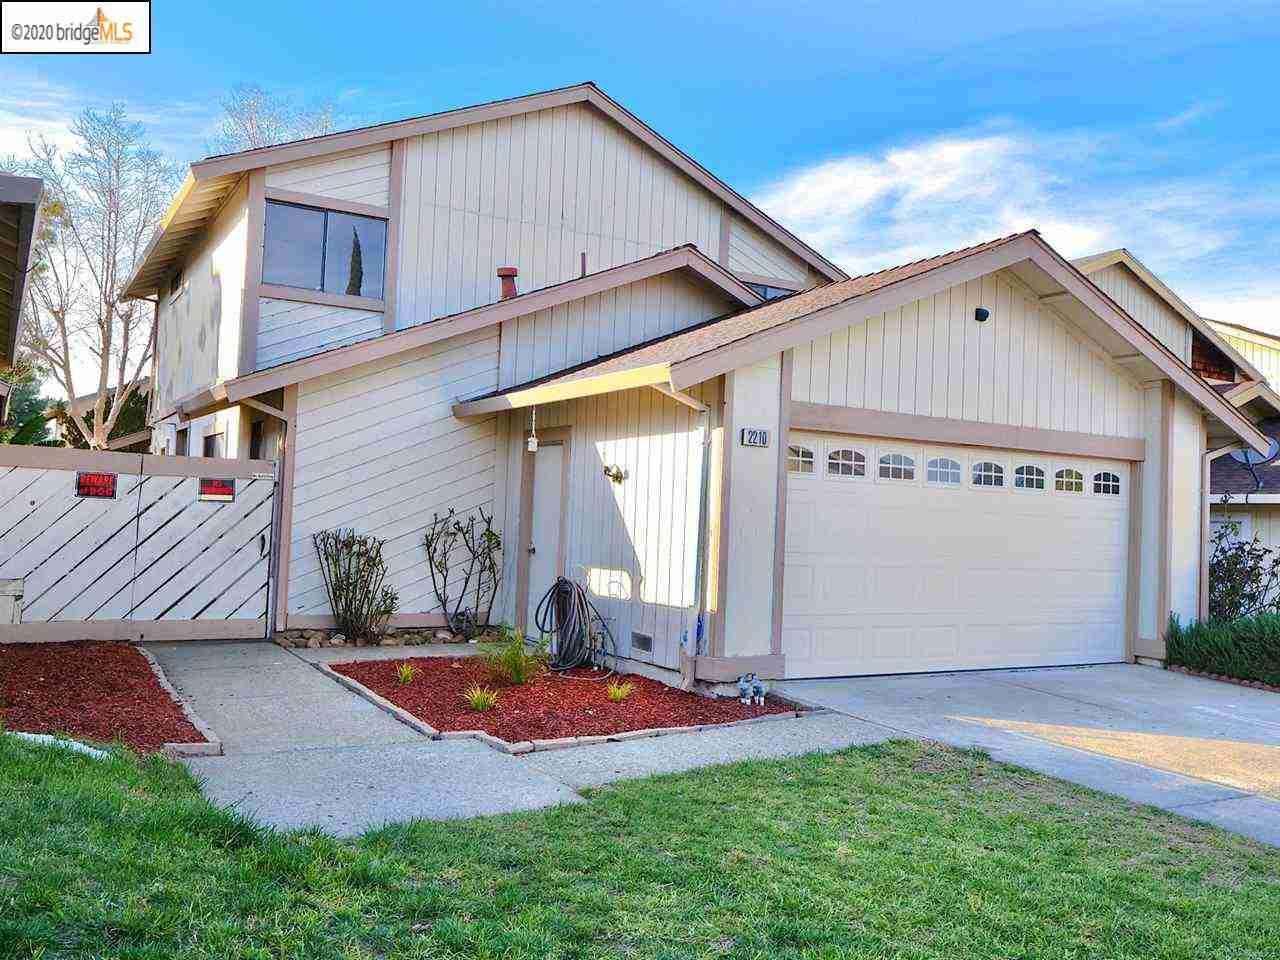 2210 Old Creek Cir Pittsburg, CA, 94565